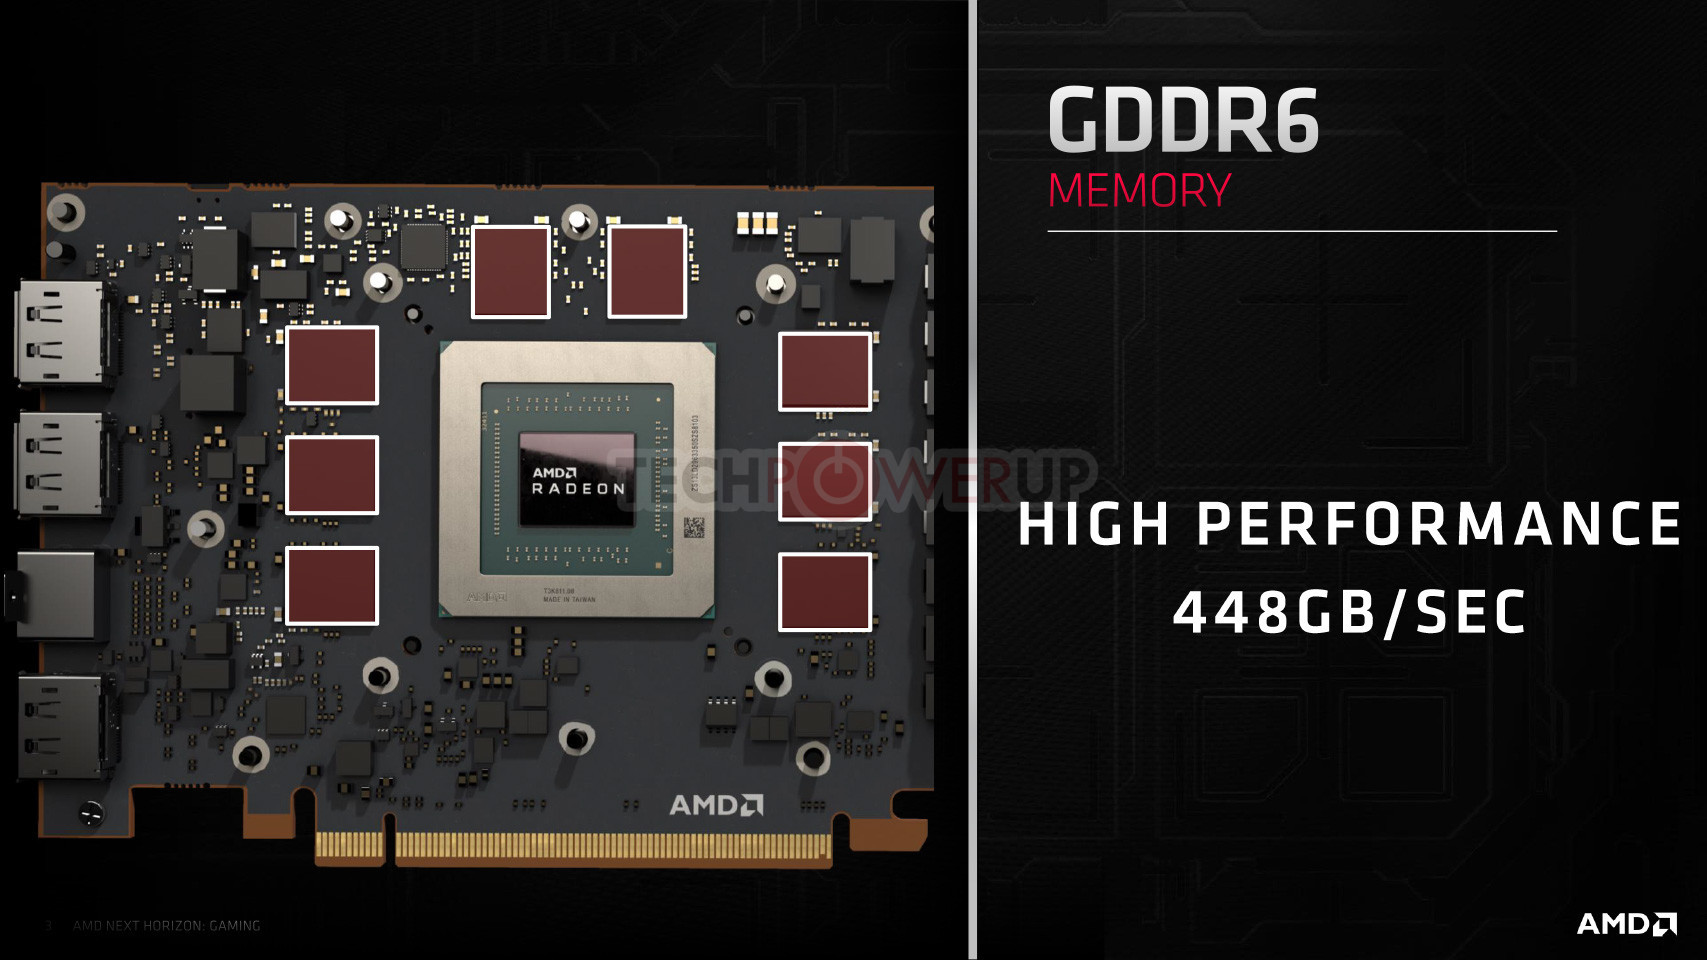 La Radeon RX 5700 supera a la GeForce RTX 2060 36